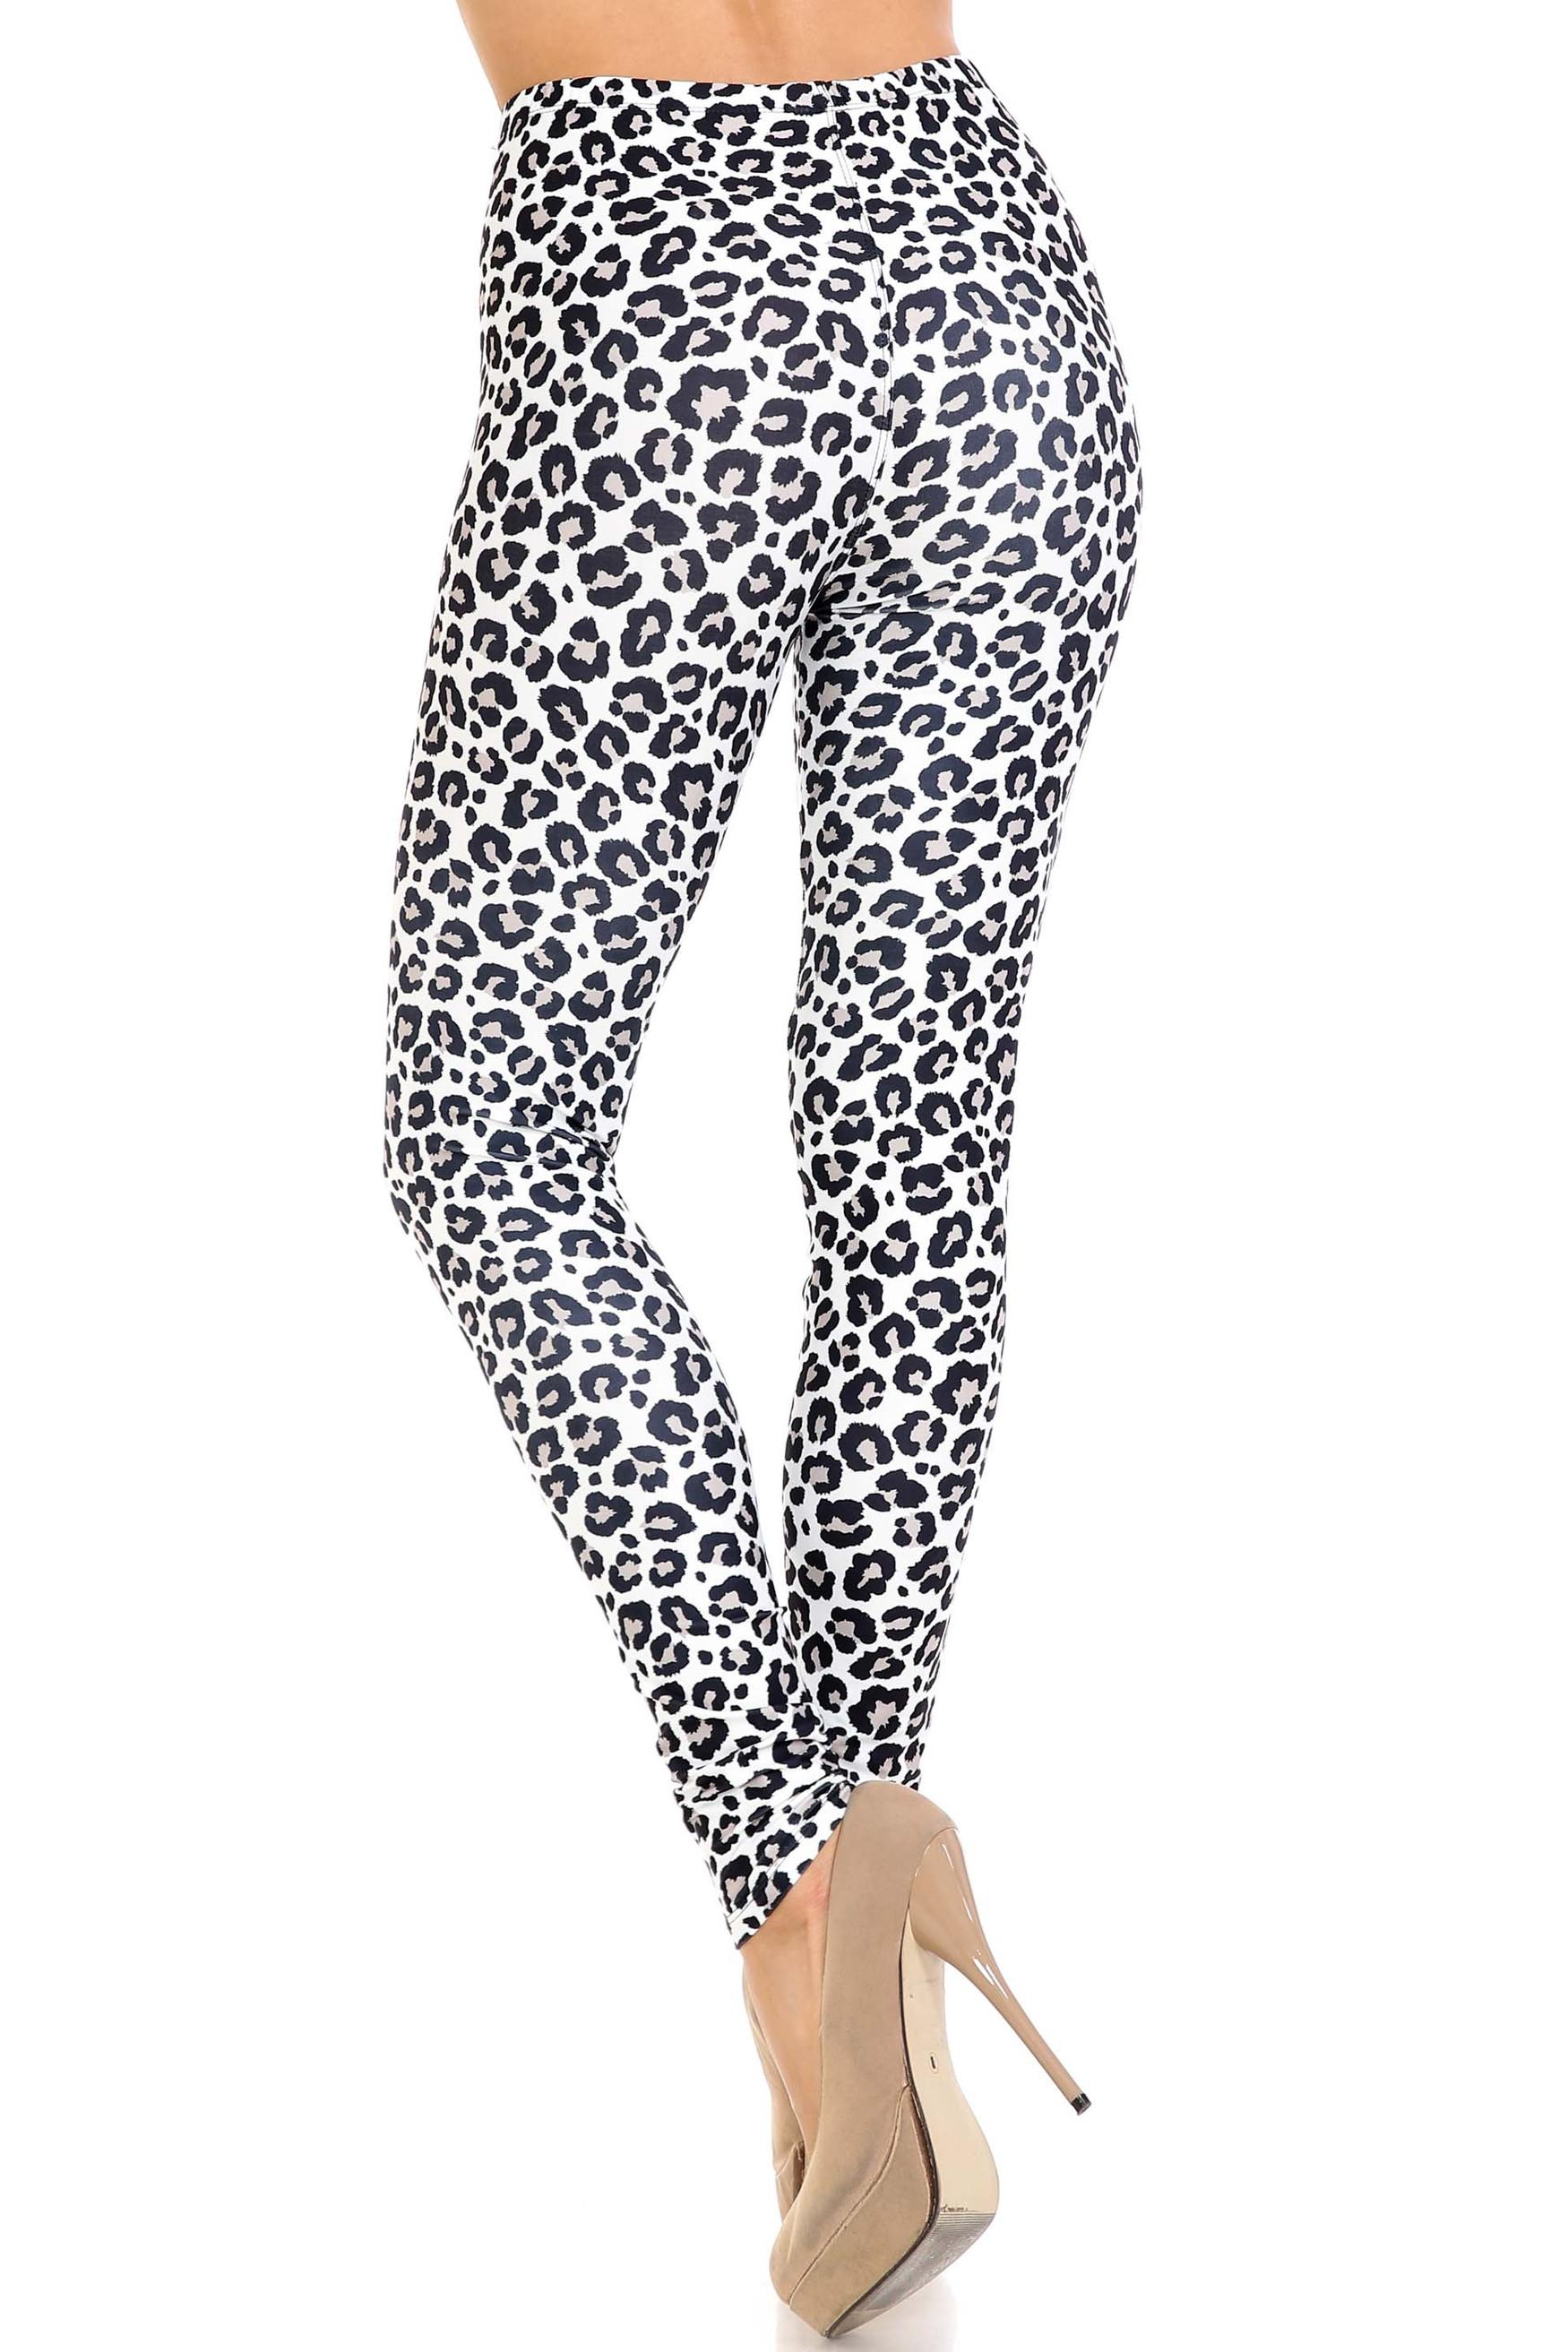 Creamy Soft Urban Leopard Plus Size Leggings - USA Fashion™